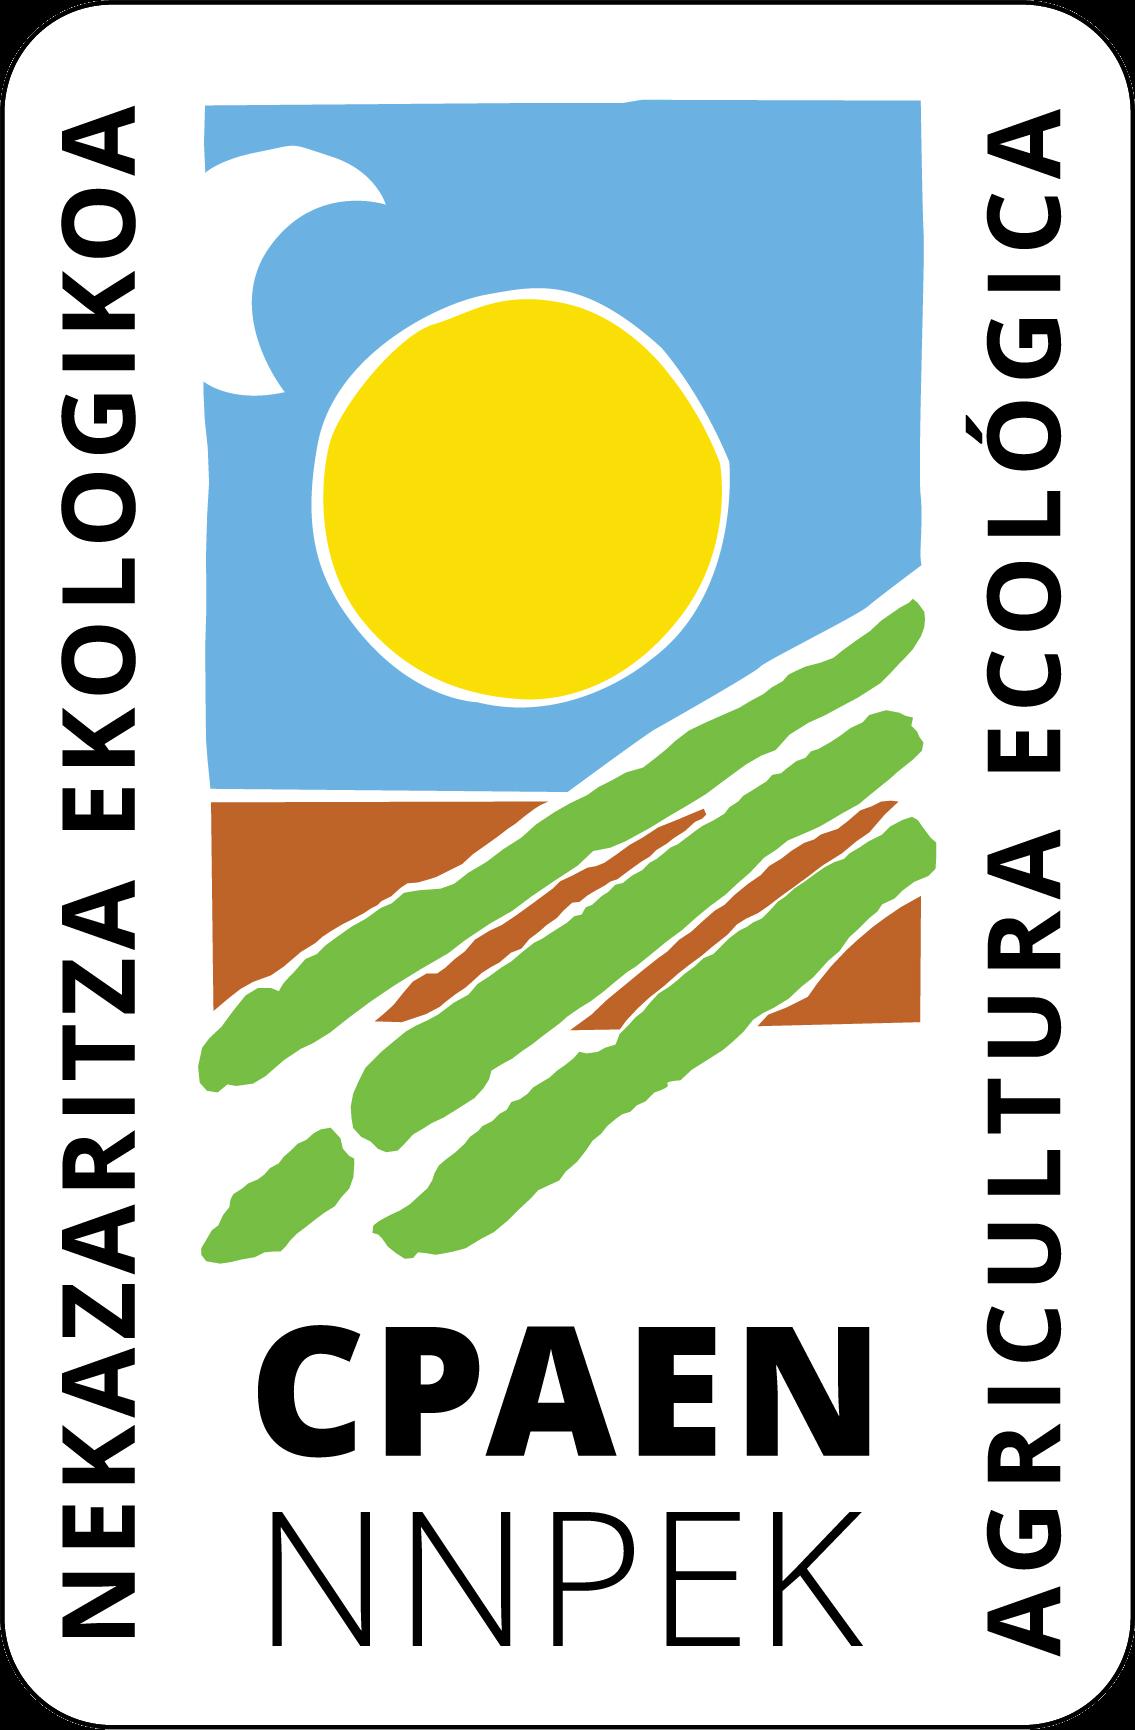 CPAEN_BILINGÜE_TRAZ-01